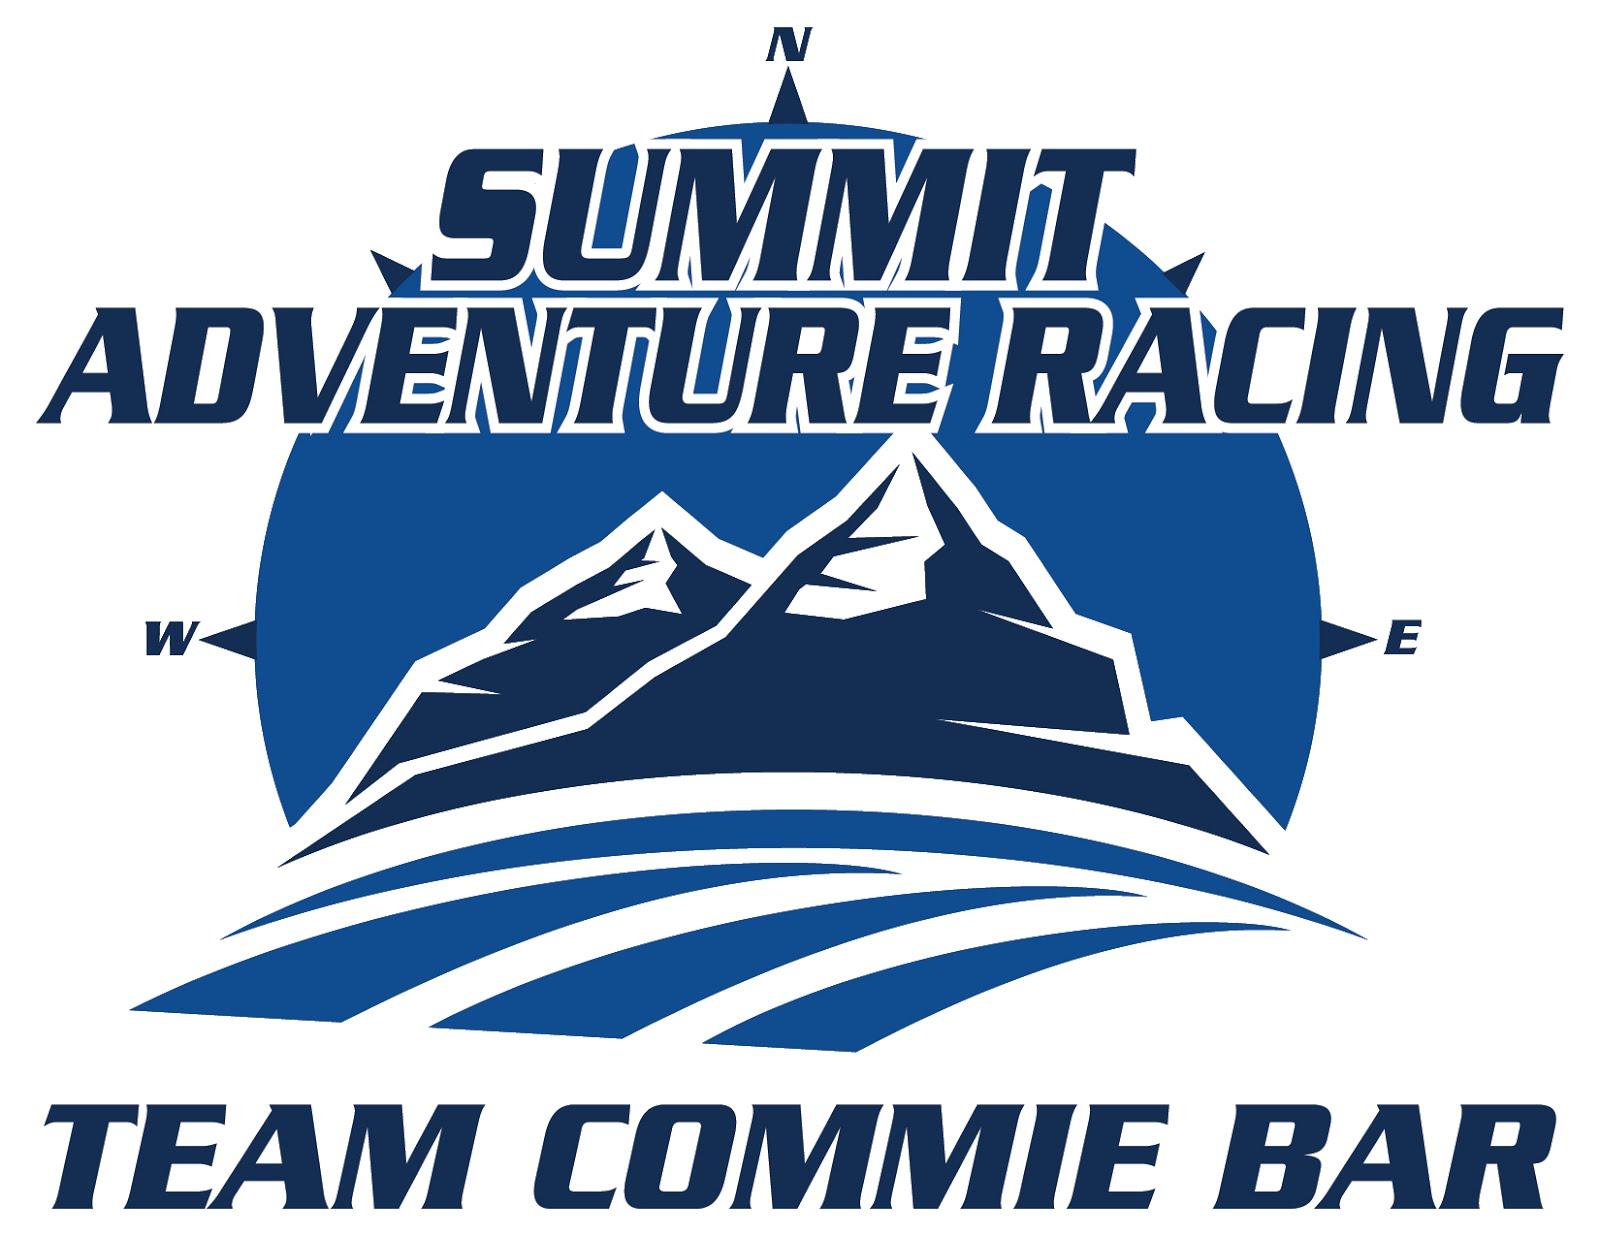 Team Commie Bar Adventure Racing